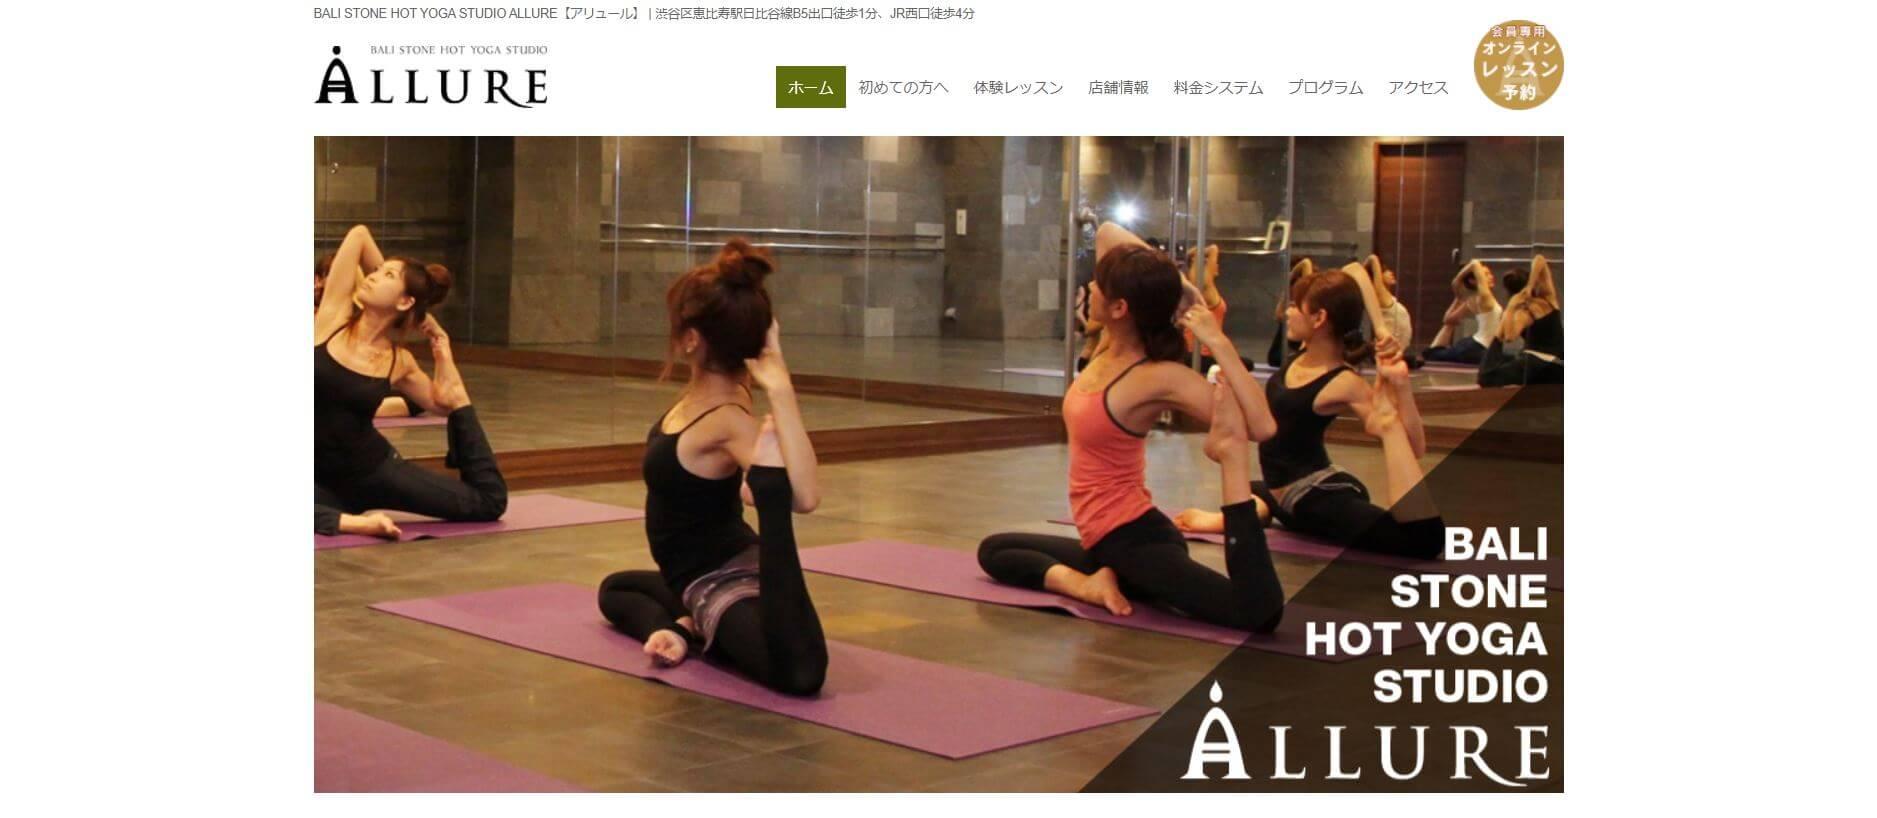 BALI STONE HOTYOGA STUDIO ALLURE CONZE店